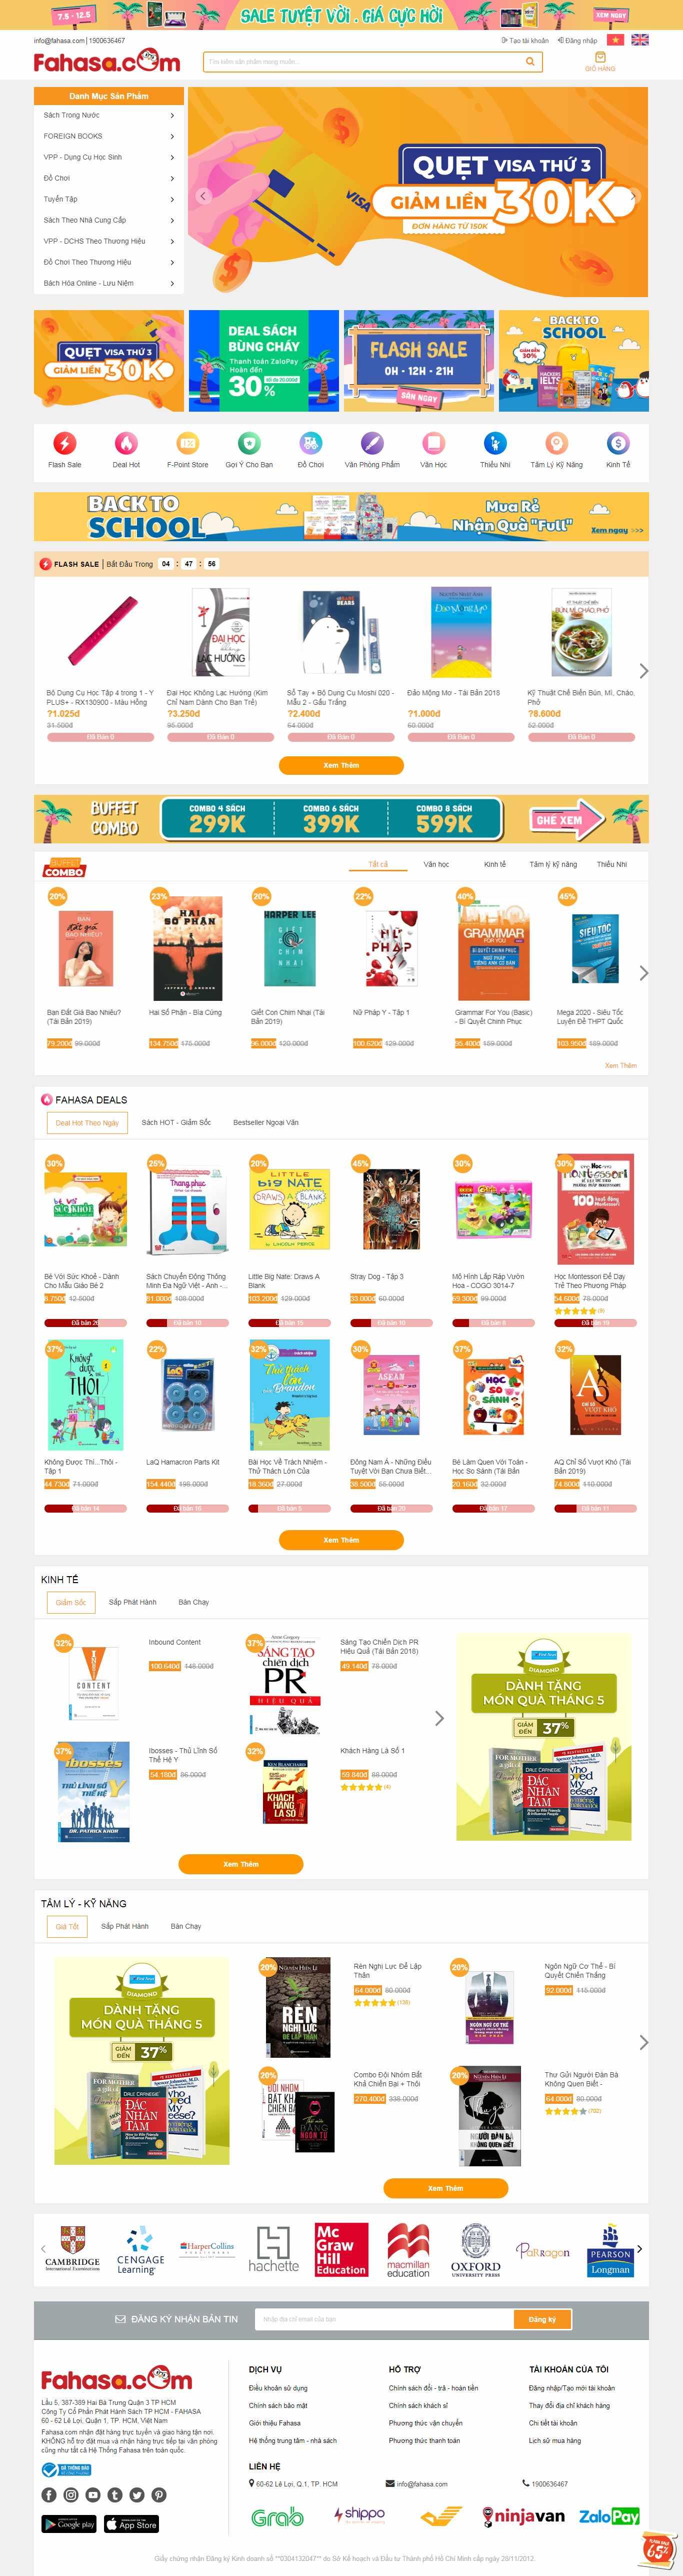 Thiết kế web sách giáo khoa - www.fahasa.com